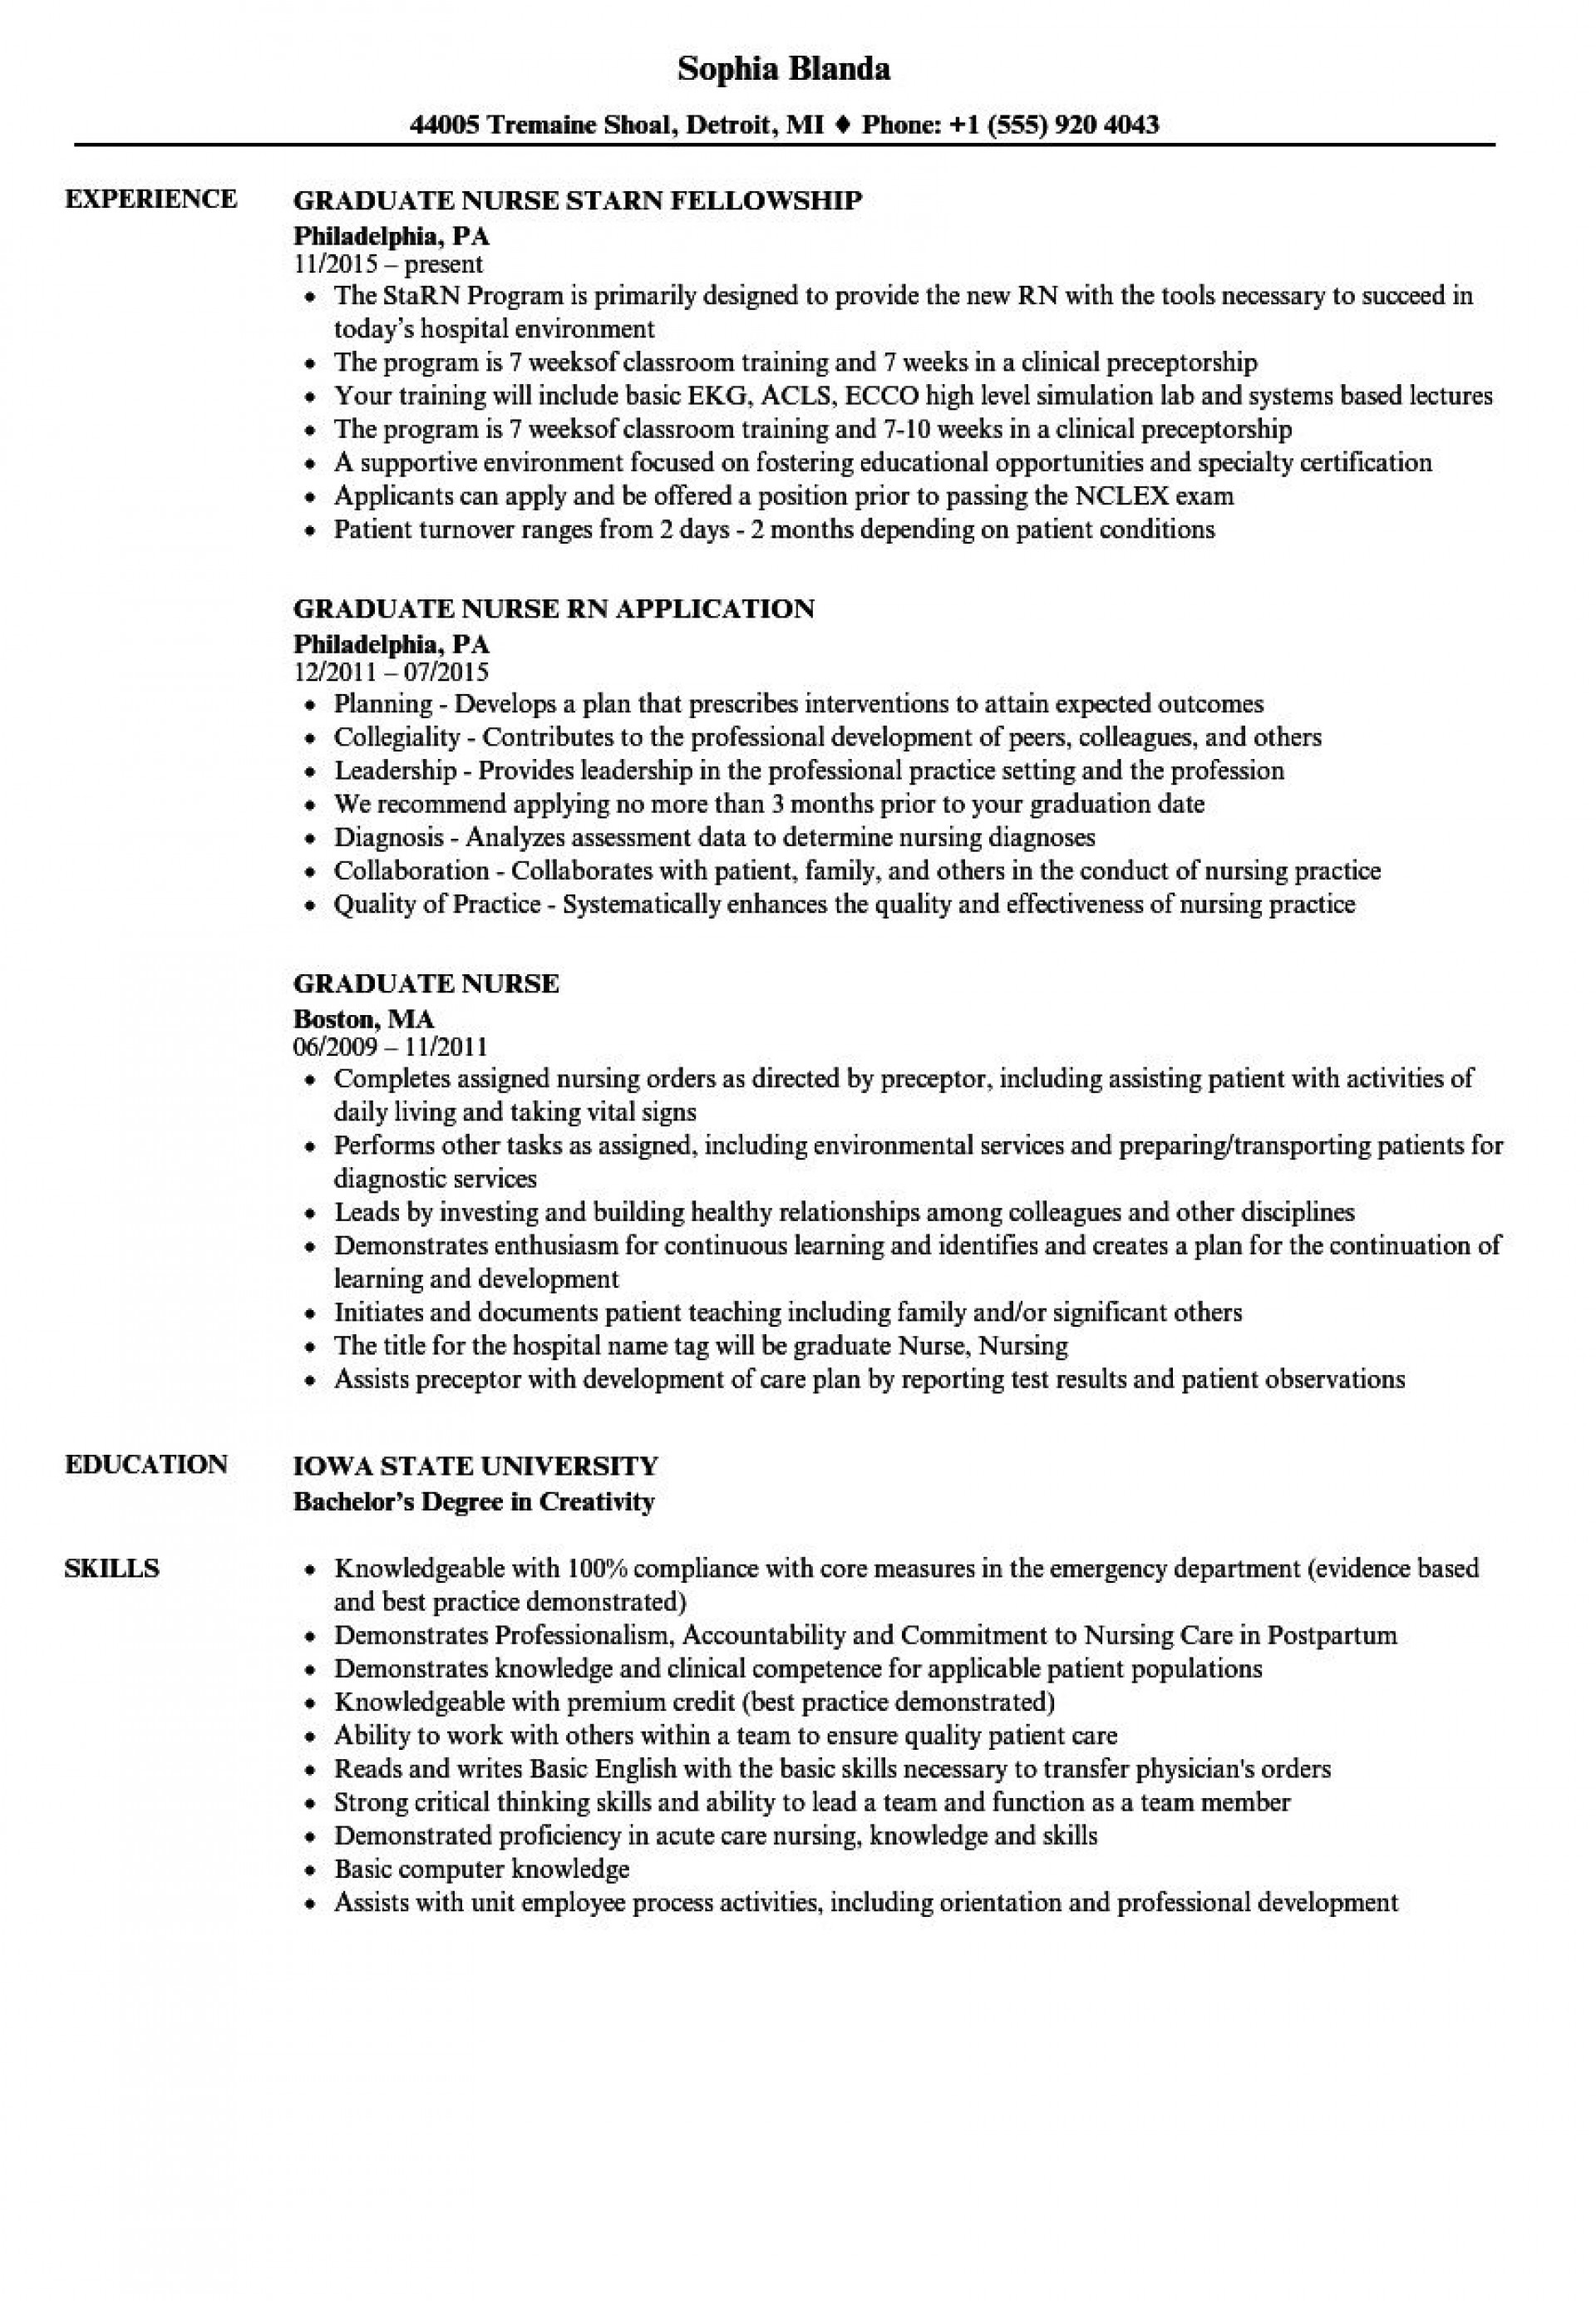 004 Breathtaking Graduate Nurse Resume Template Picture  Student Free New Practitioner Grad1920